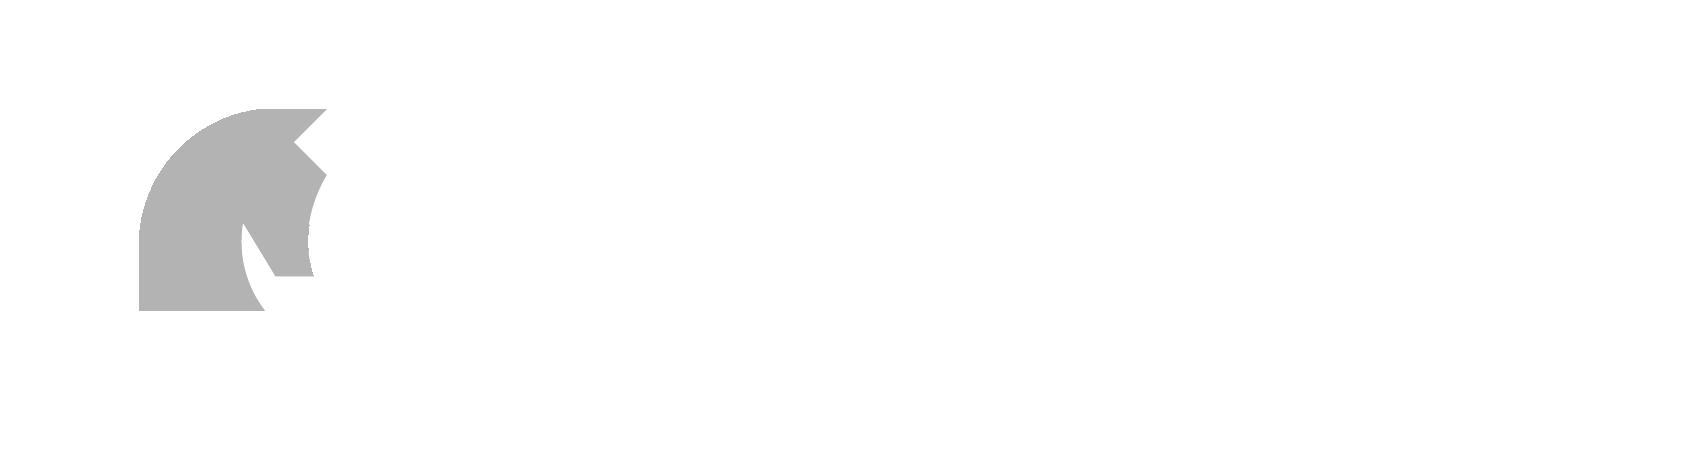 Two Knights Defense (2KD) white logo version.